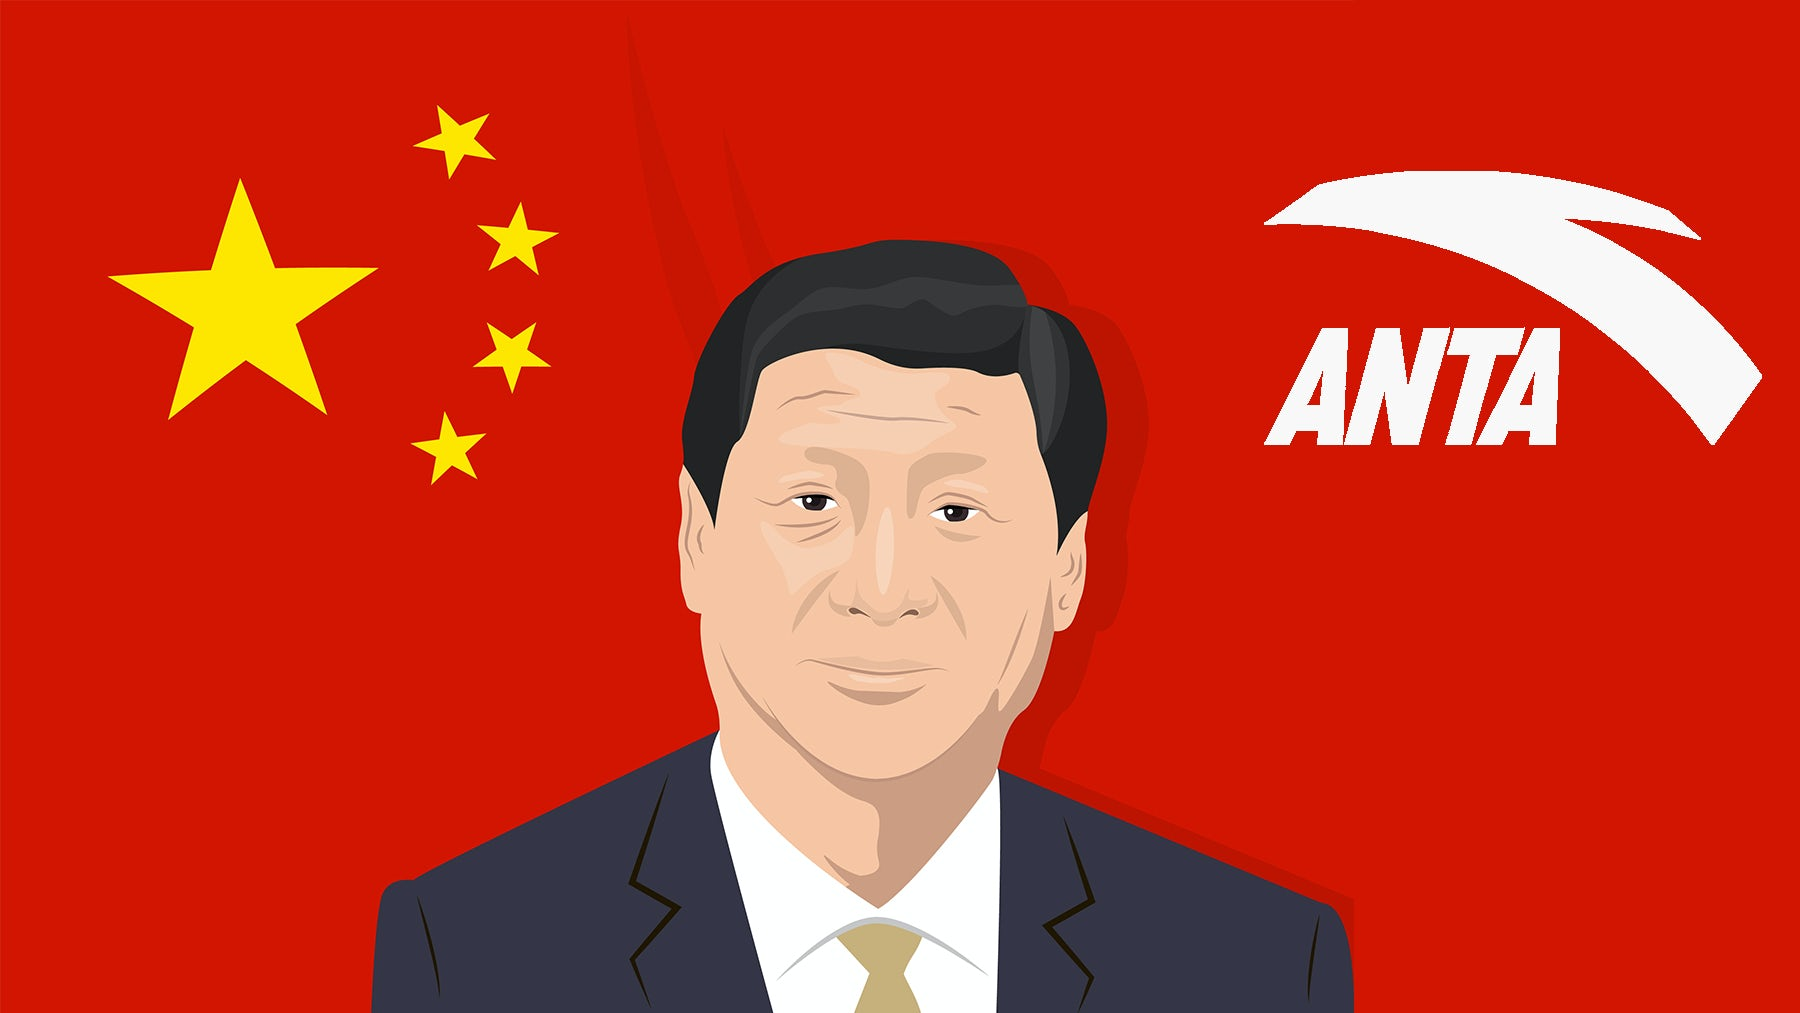 China's Sportswear Giant Anta Gets Presidential Plug